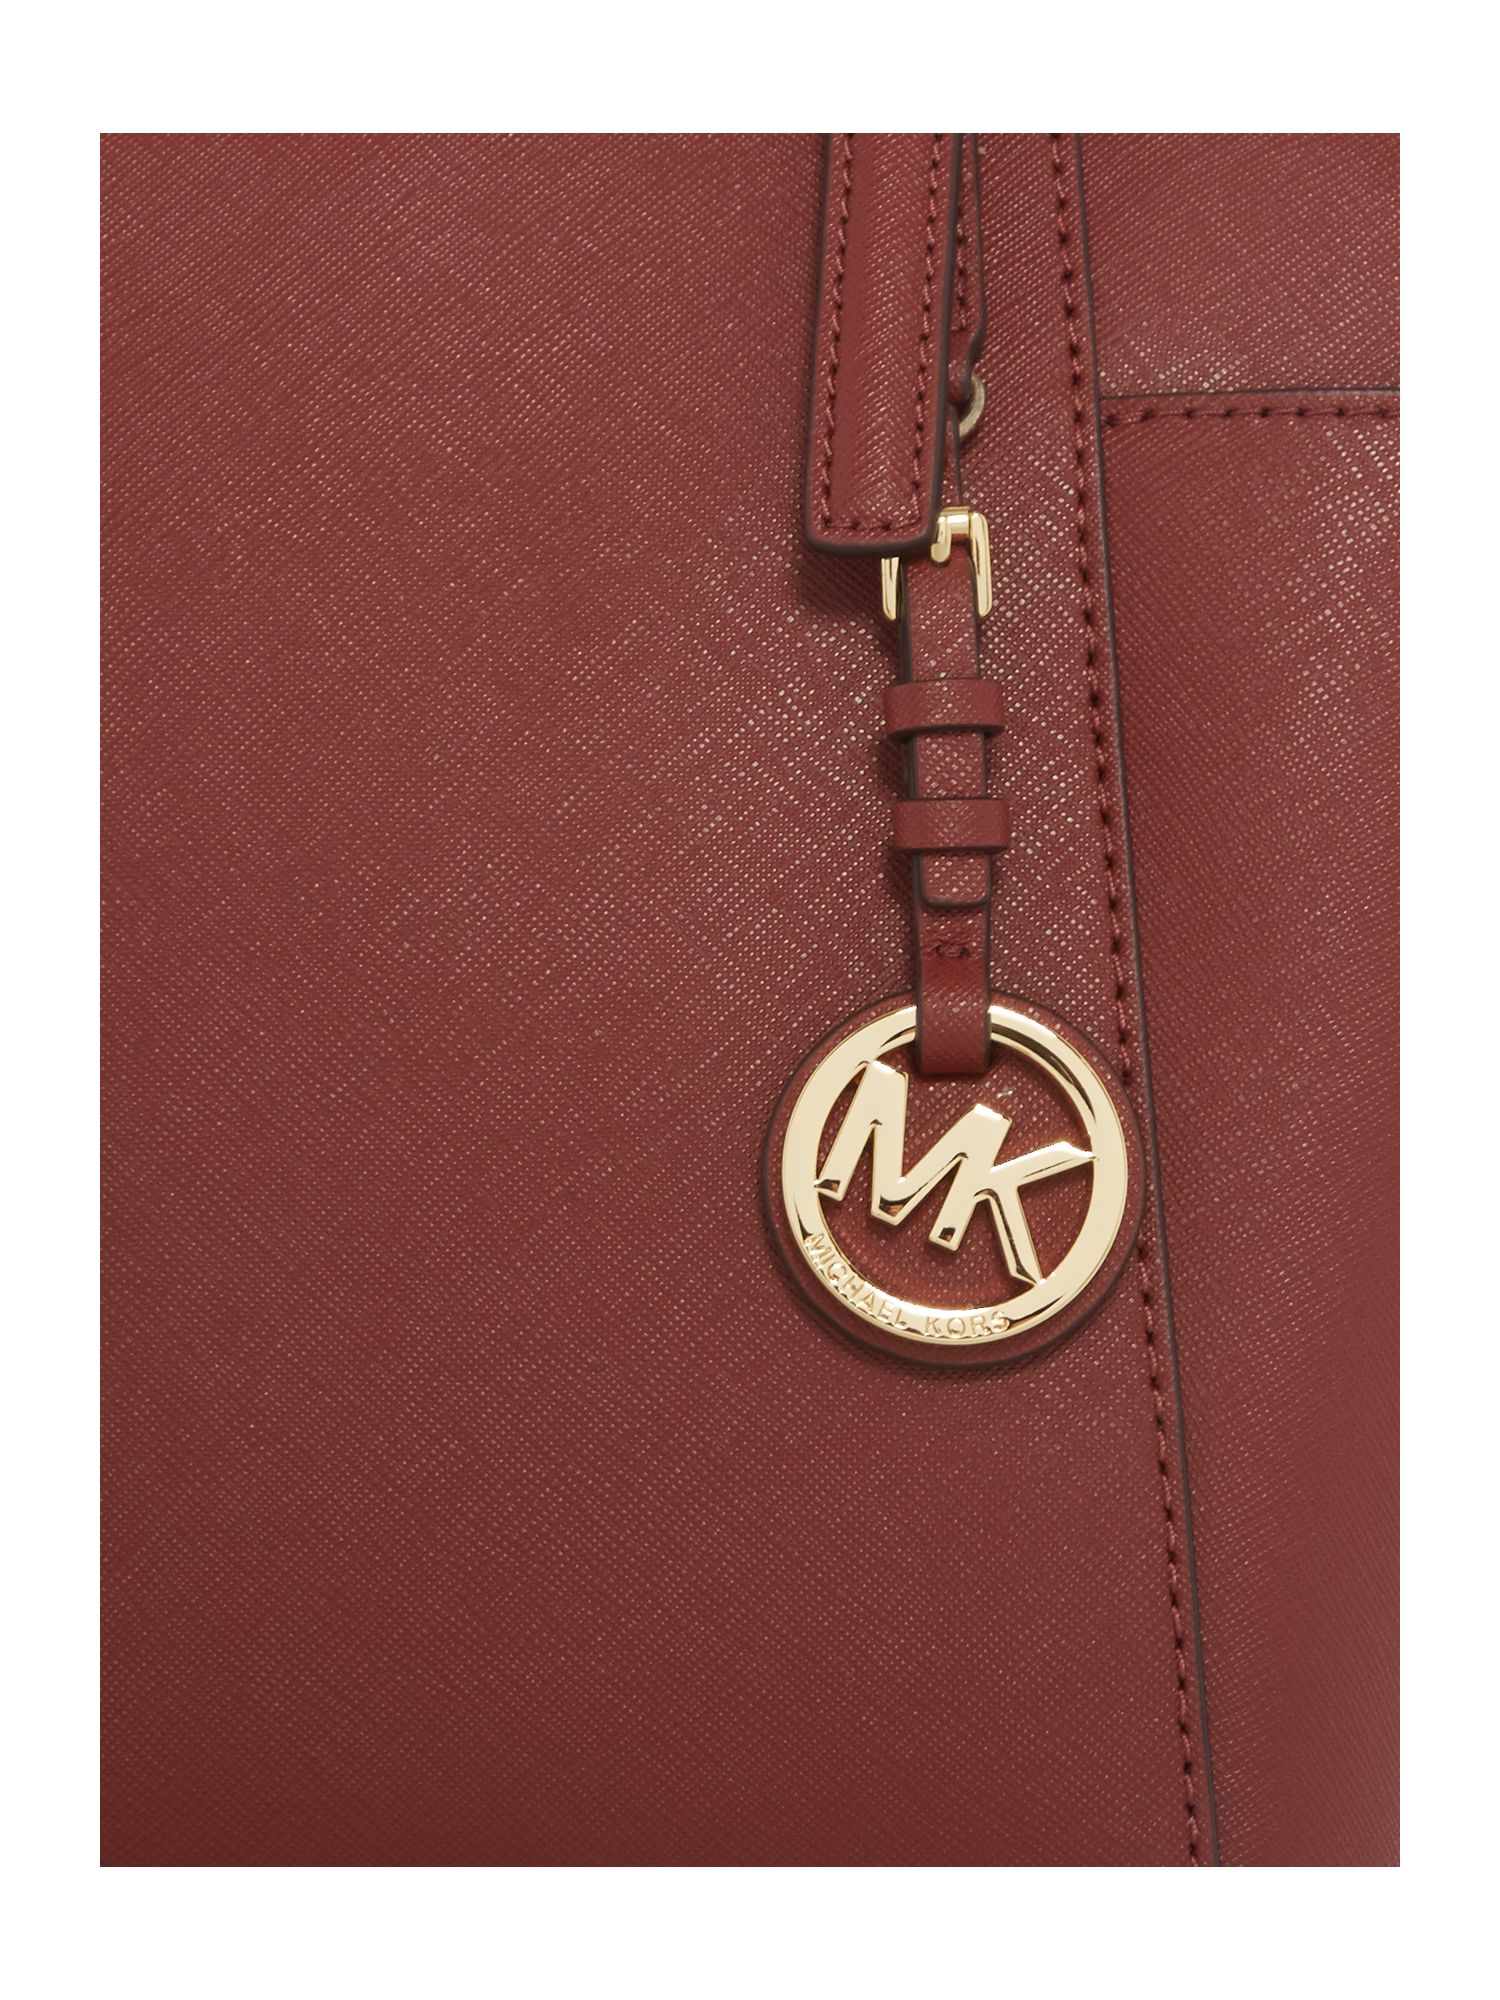 Michael Kors Jetset Item Red Tote Bag